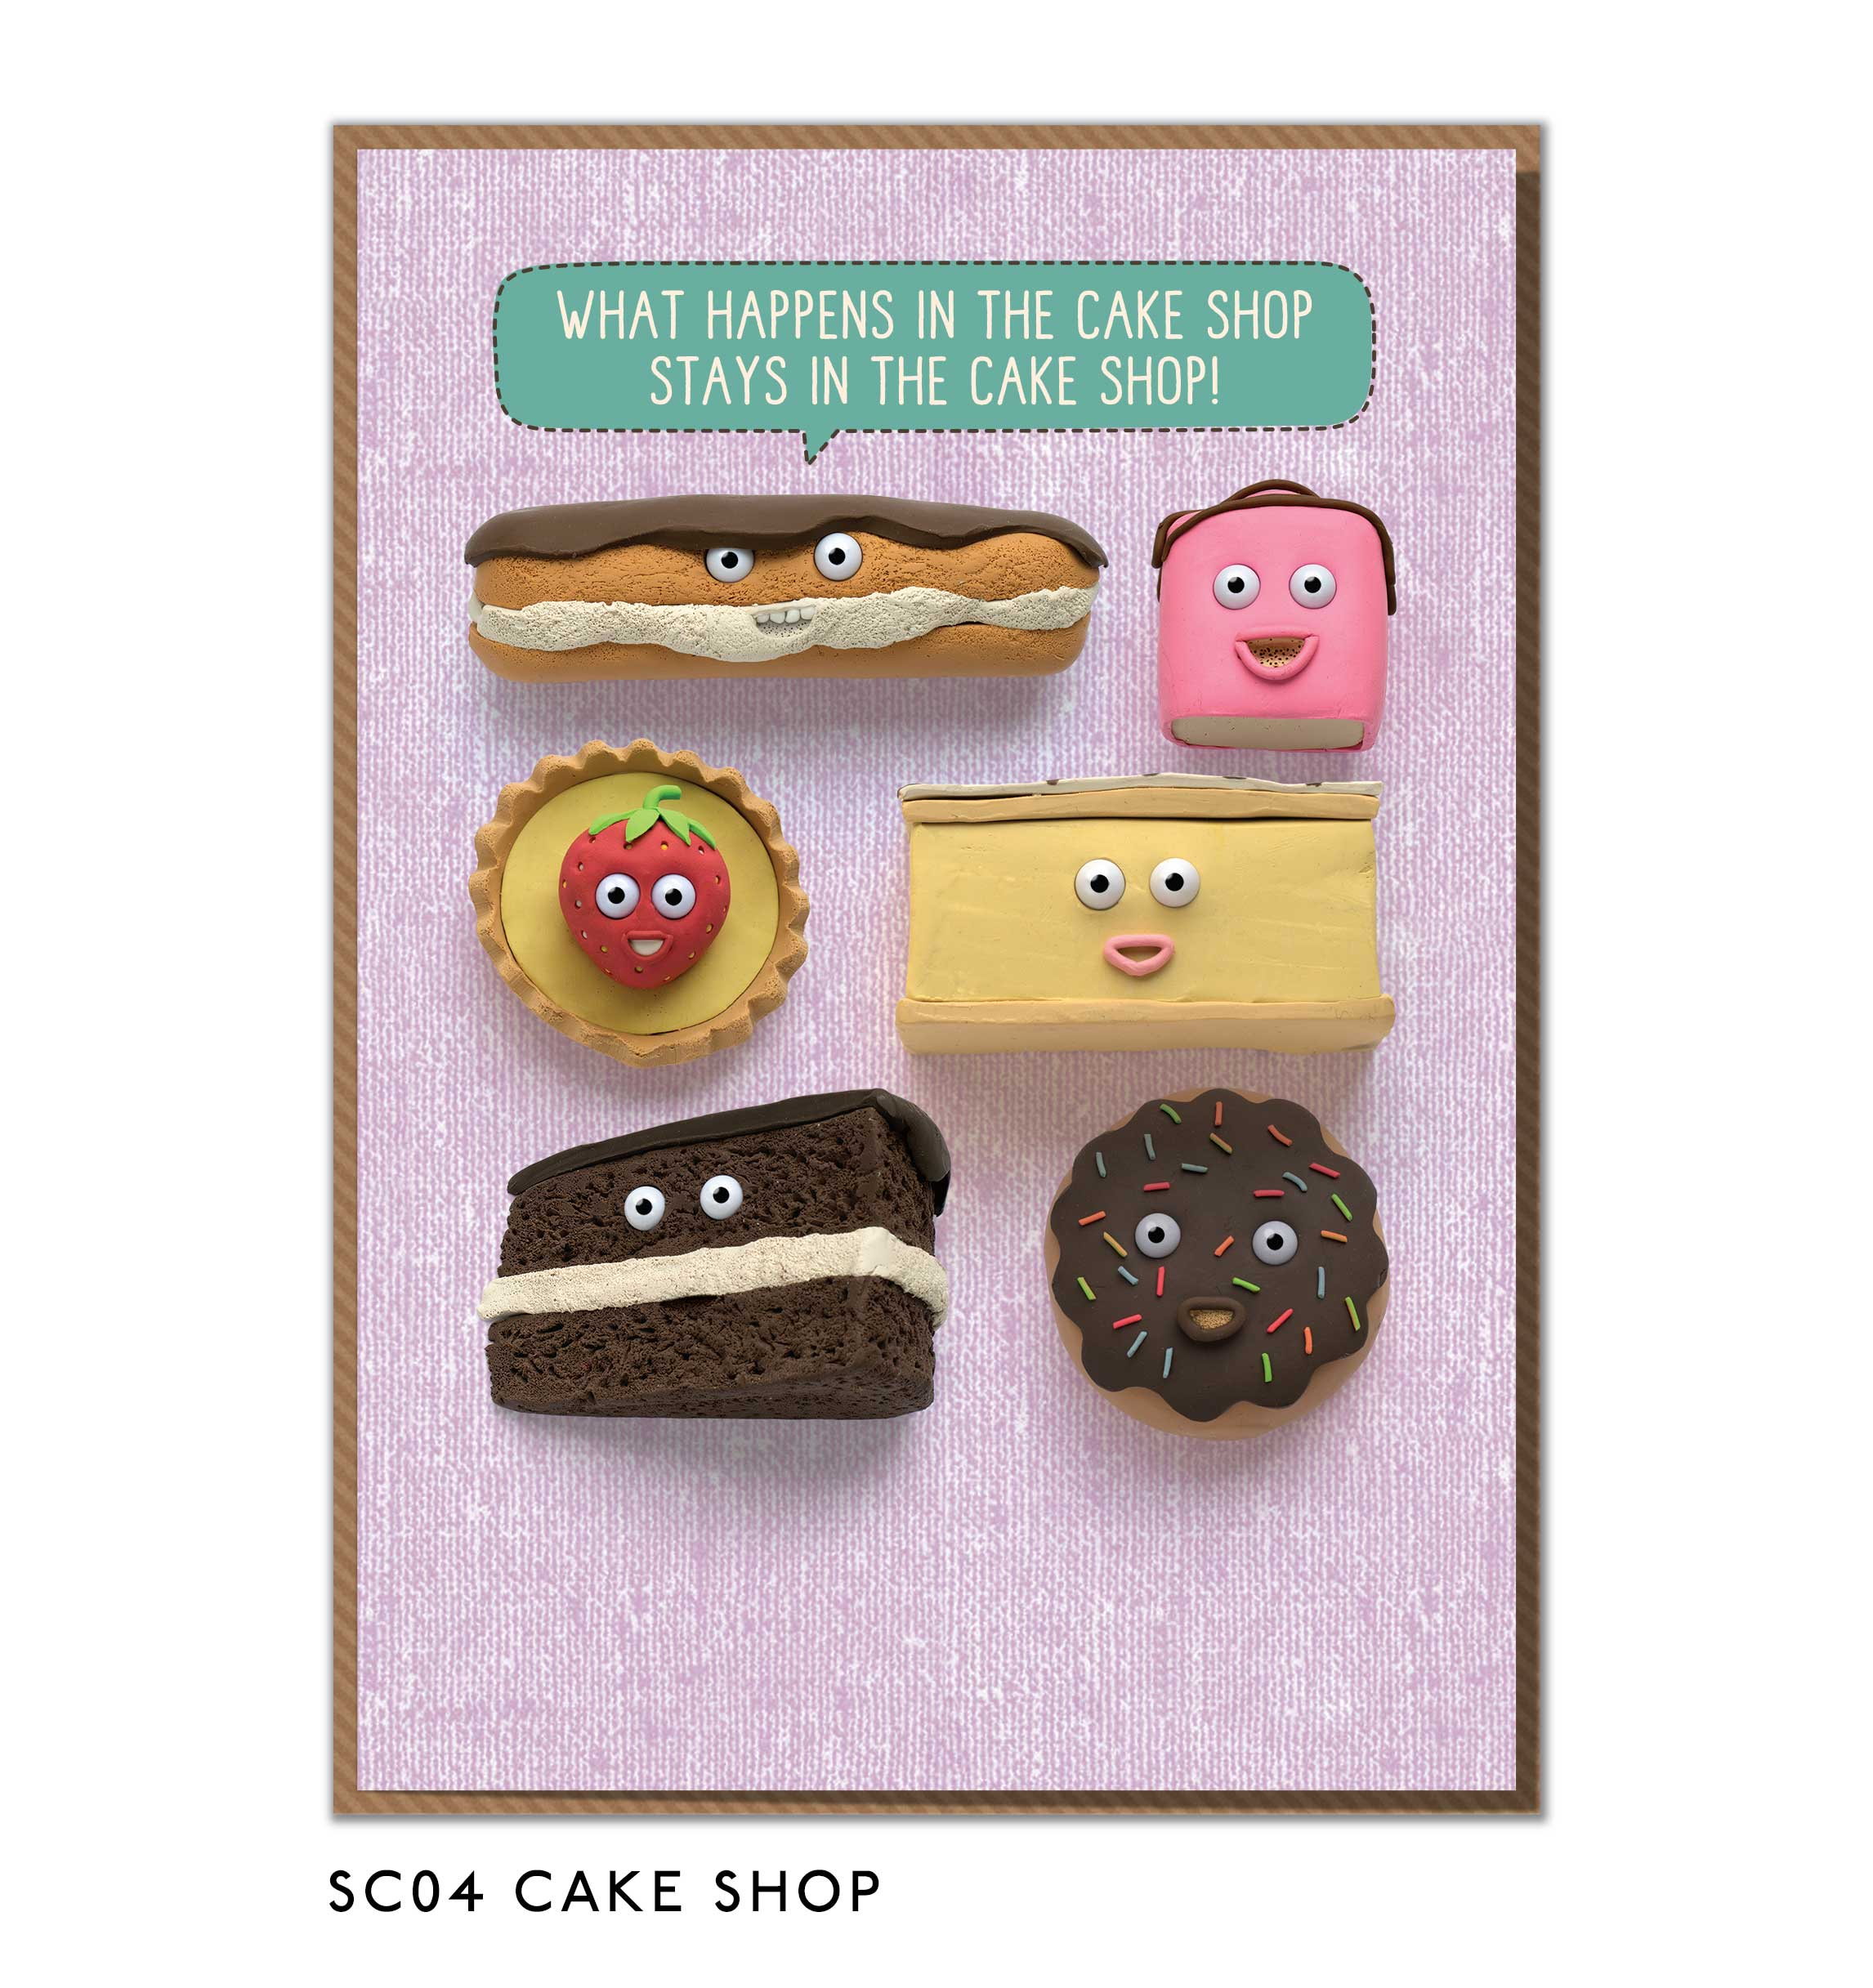 SC04-CAKE-SHOP.jpg